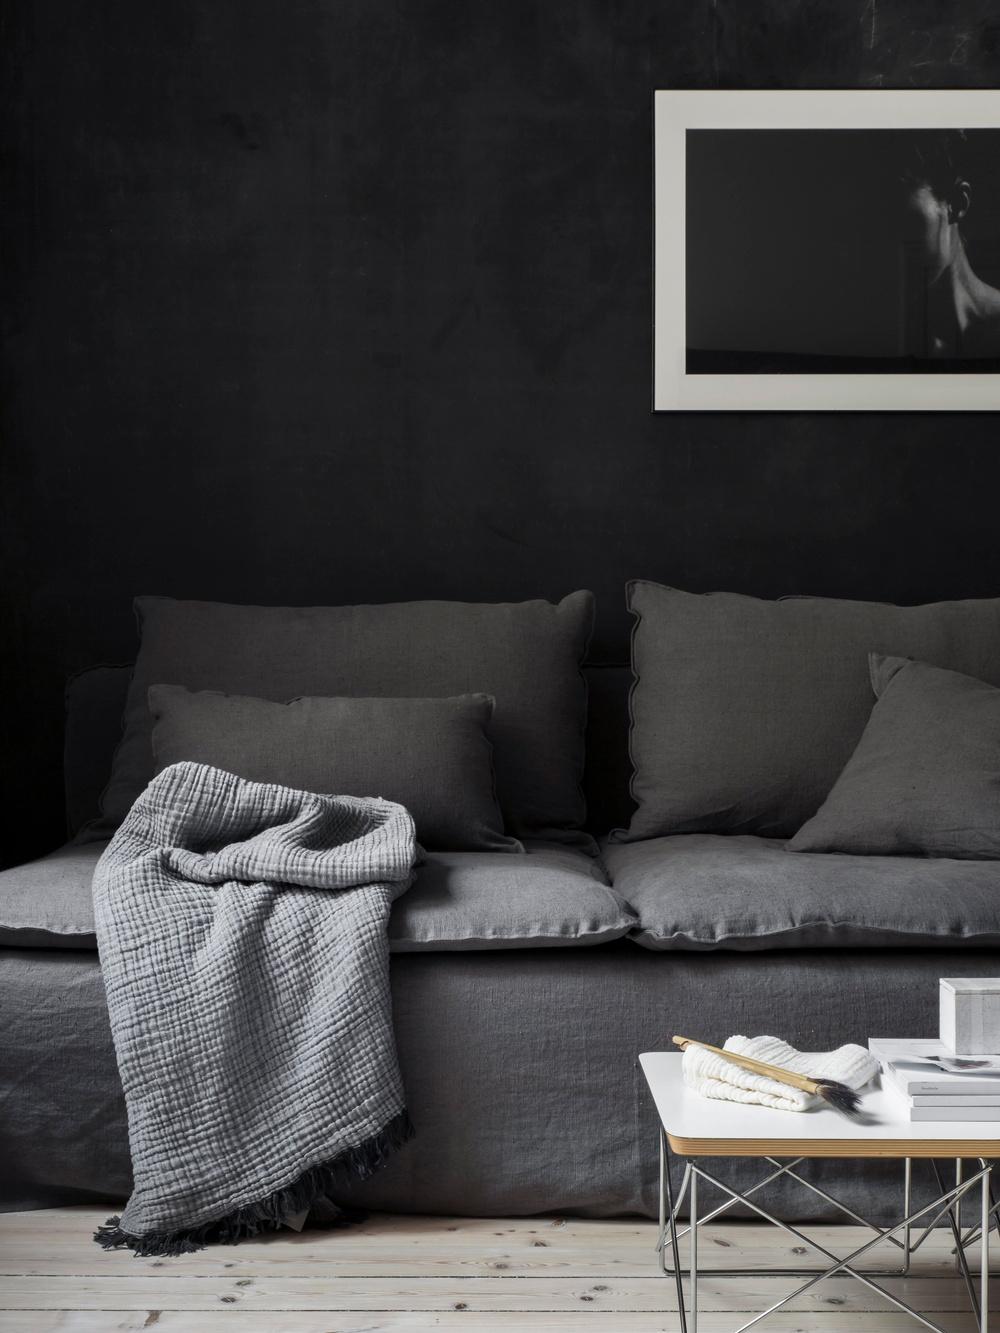 Bemz cover, Loose Fit Urban, for Söderhamn 3 seater sofa, fabric: Rosendal Pure Washed Linen Medium Grey. Cushion cover, Loose Fit Urban, fabric: Rosendal Pure Washed Linen Medium Grey. Styled by Pella Hedeby. Photographer Sara Medina Lind.